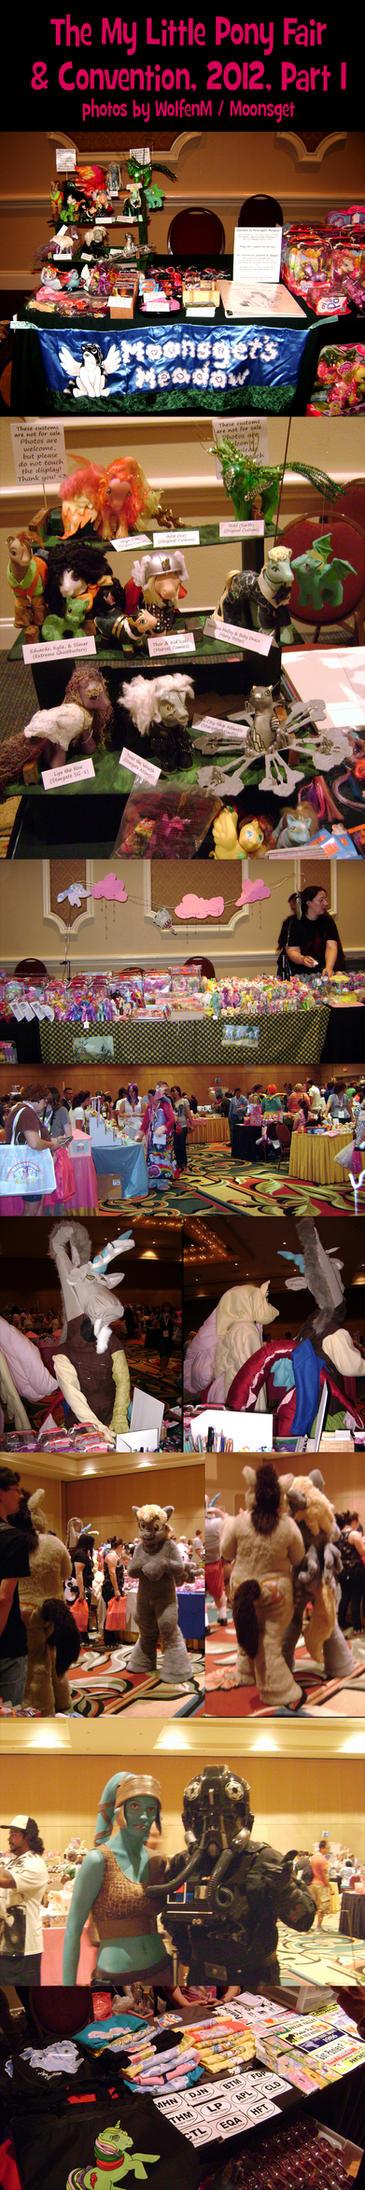 MLP Fair 2012 Part 1 by CanisCamera